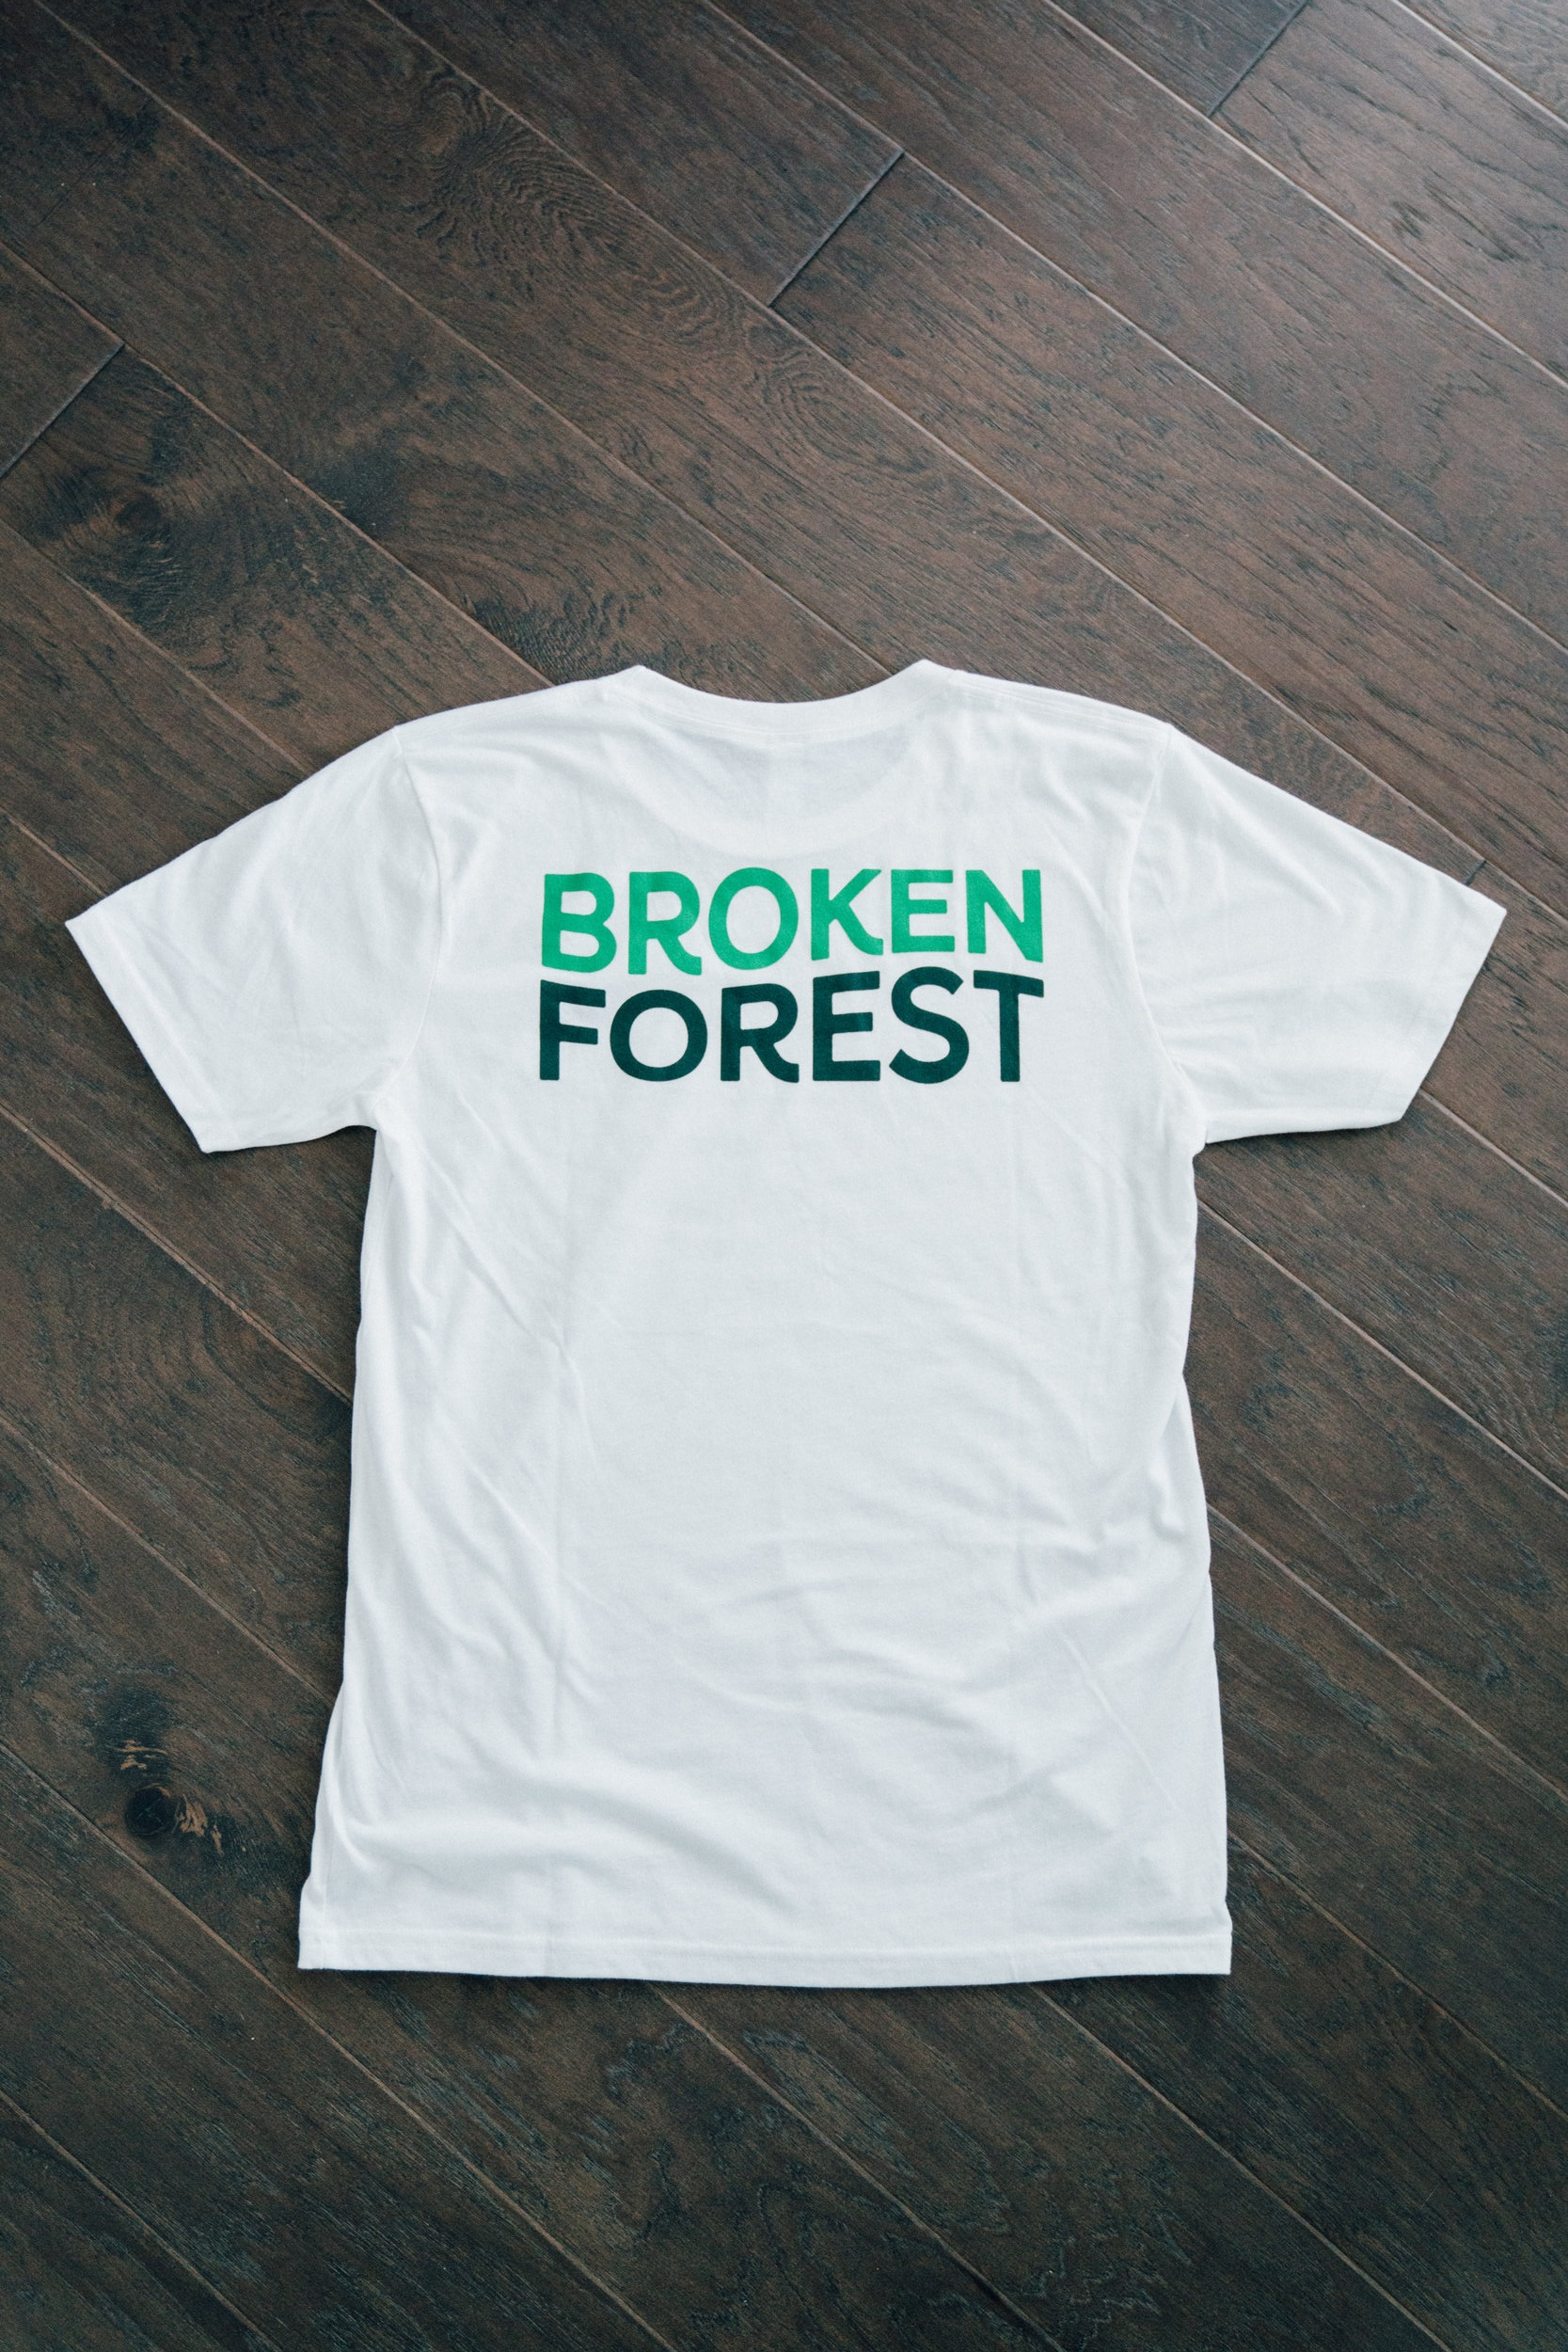 Broken+Forest+Line+4-64.jpg